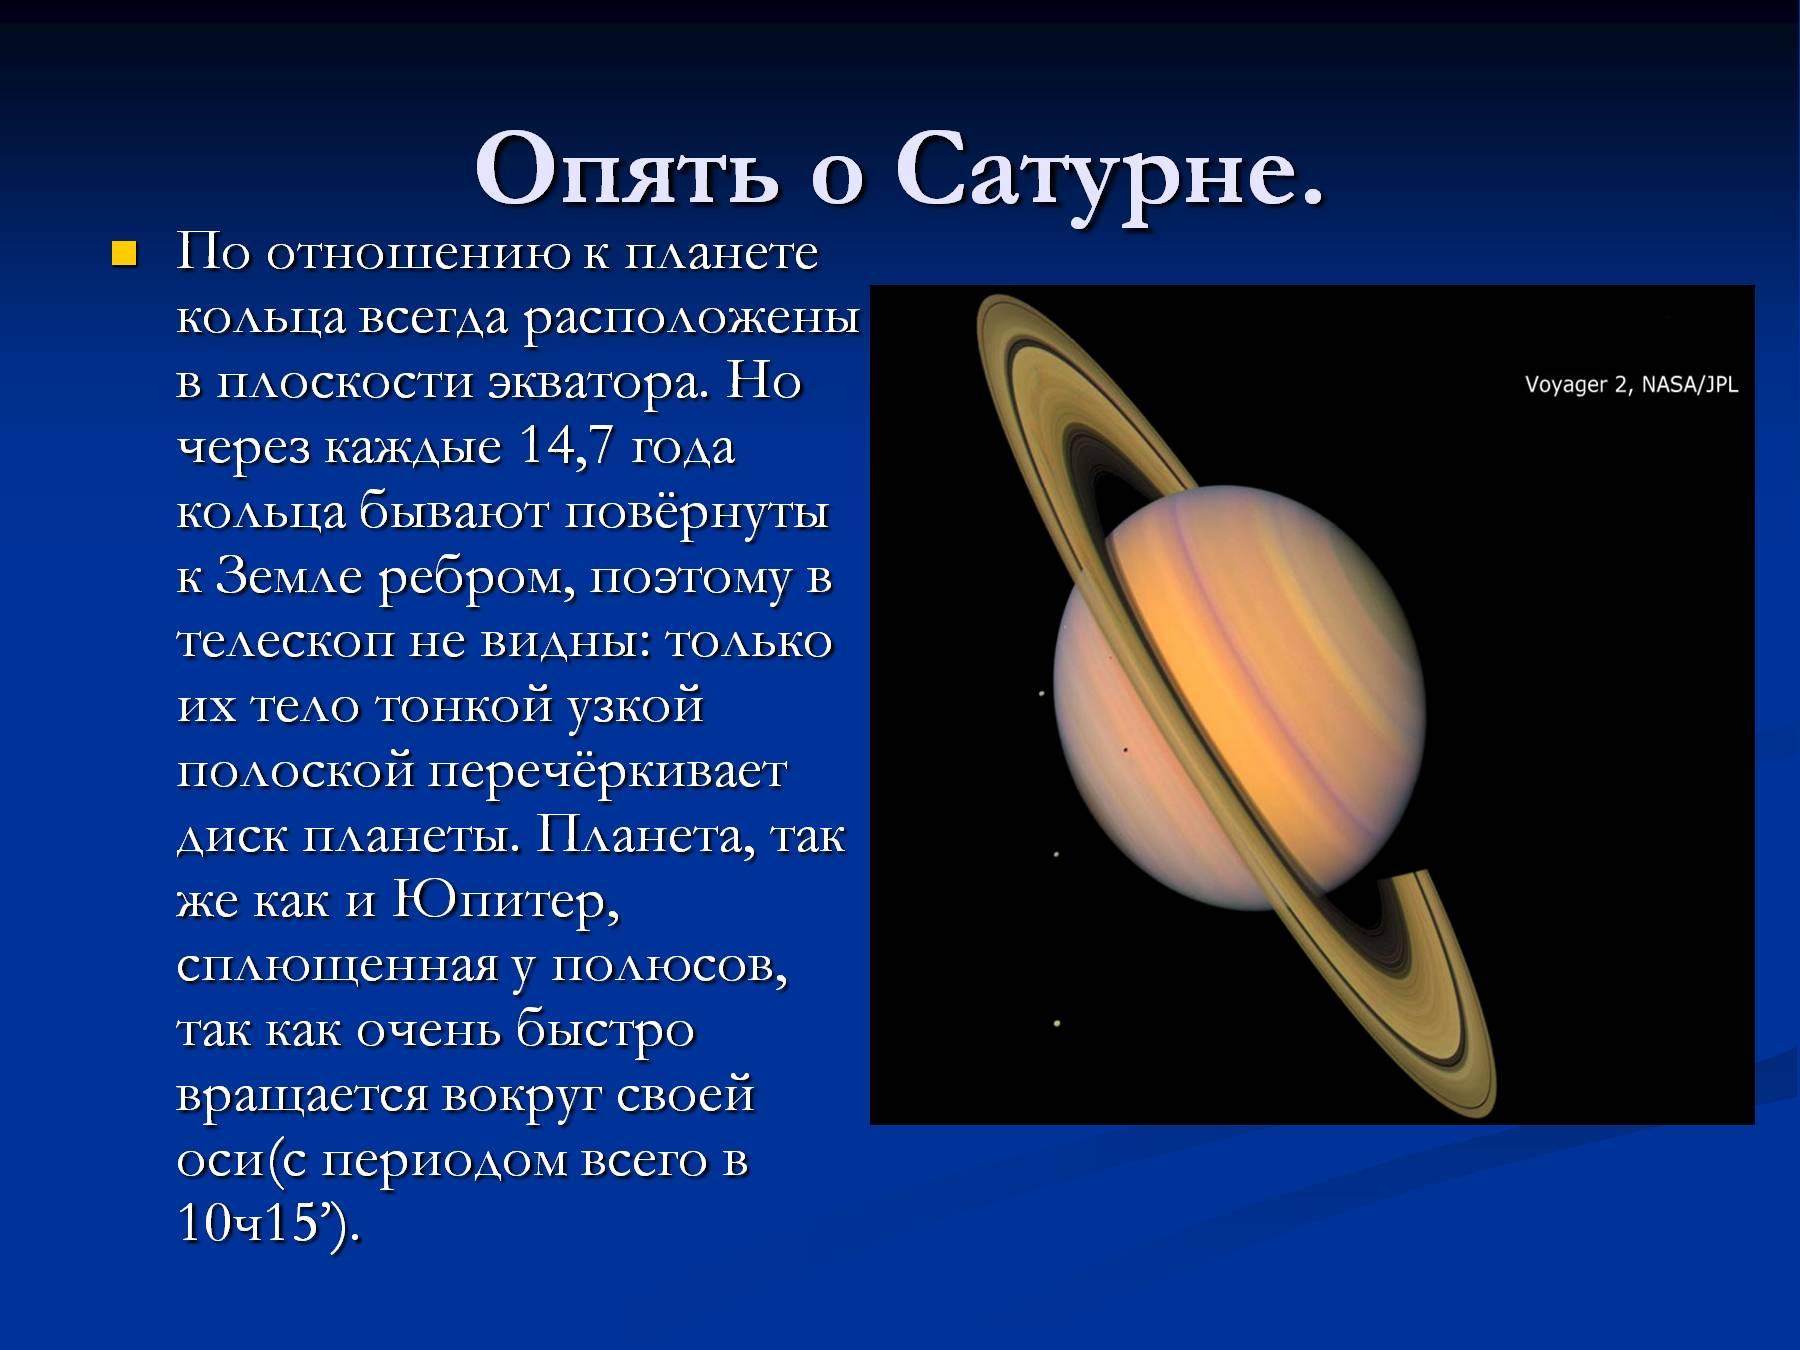 какое место занимает сатурн